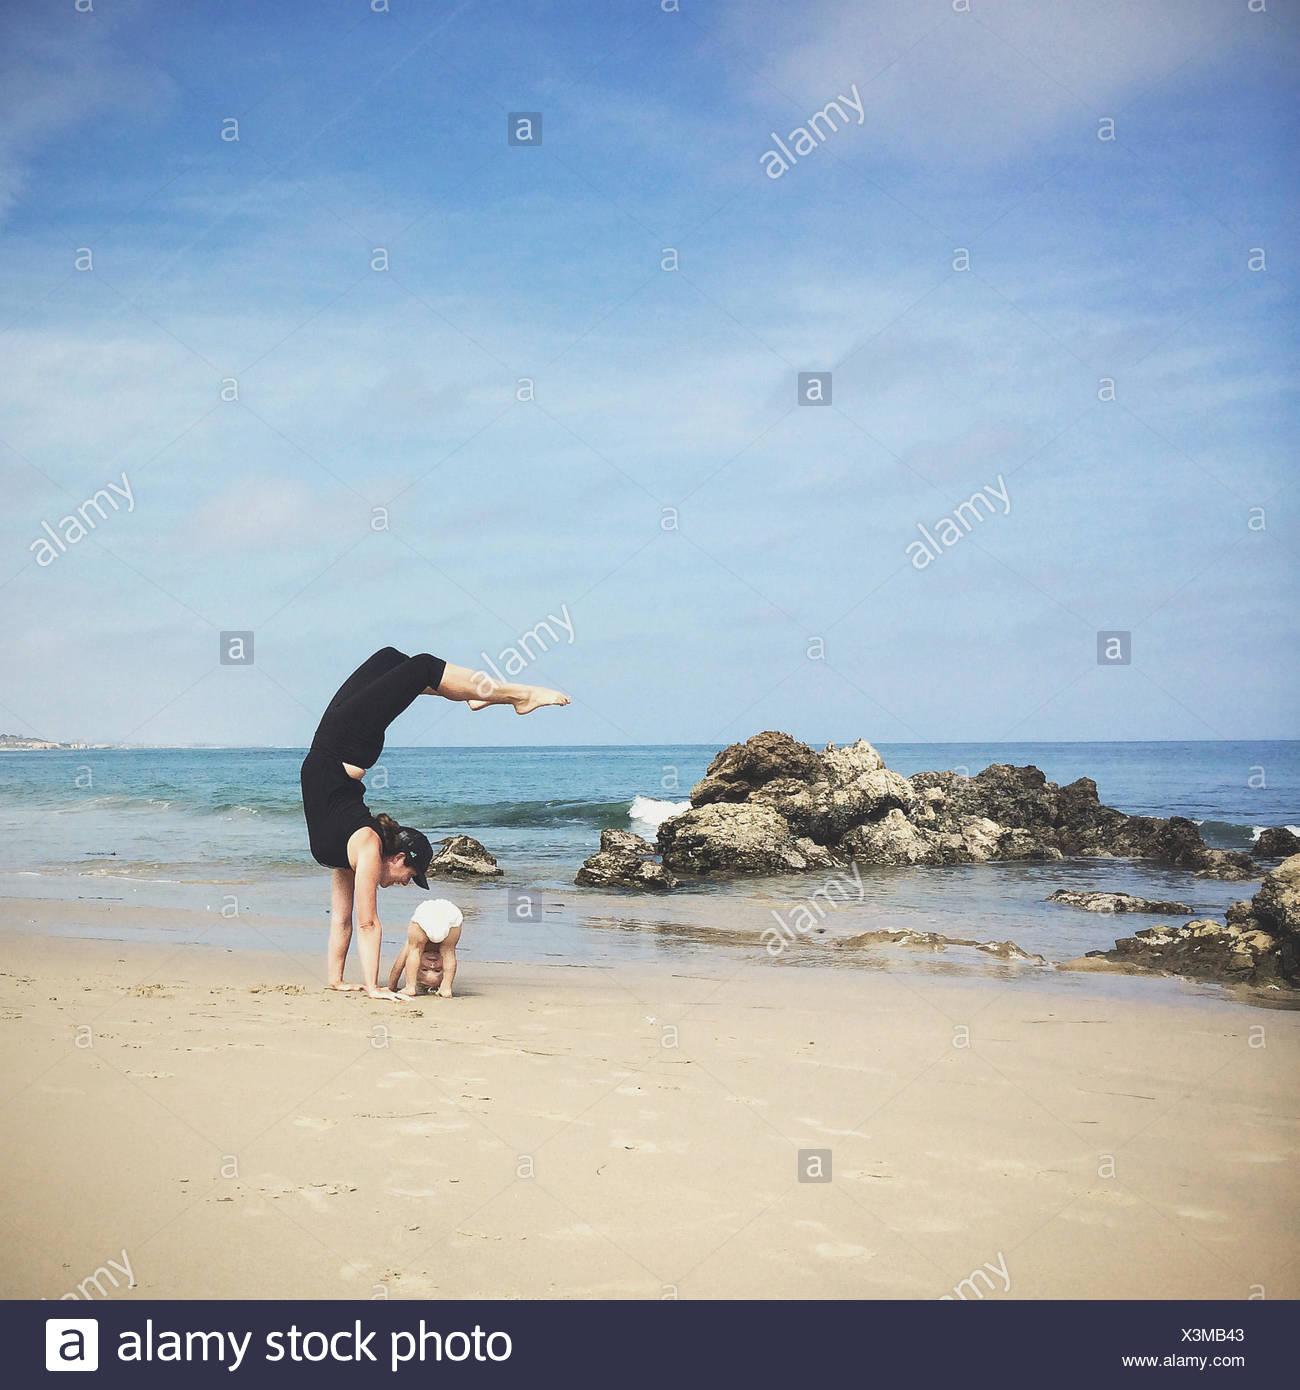 Mother and son doing yoga on beach, California, america, USA Stock Photo